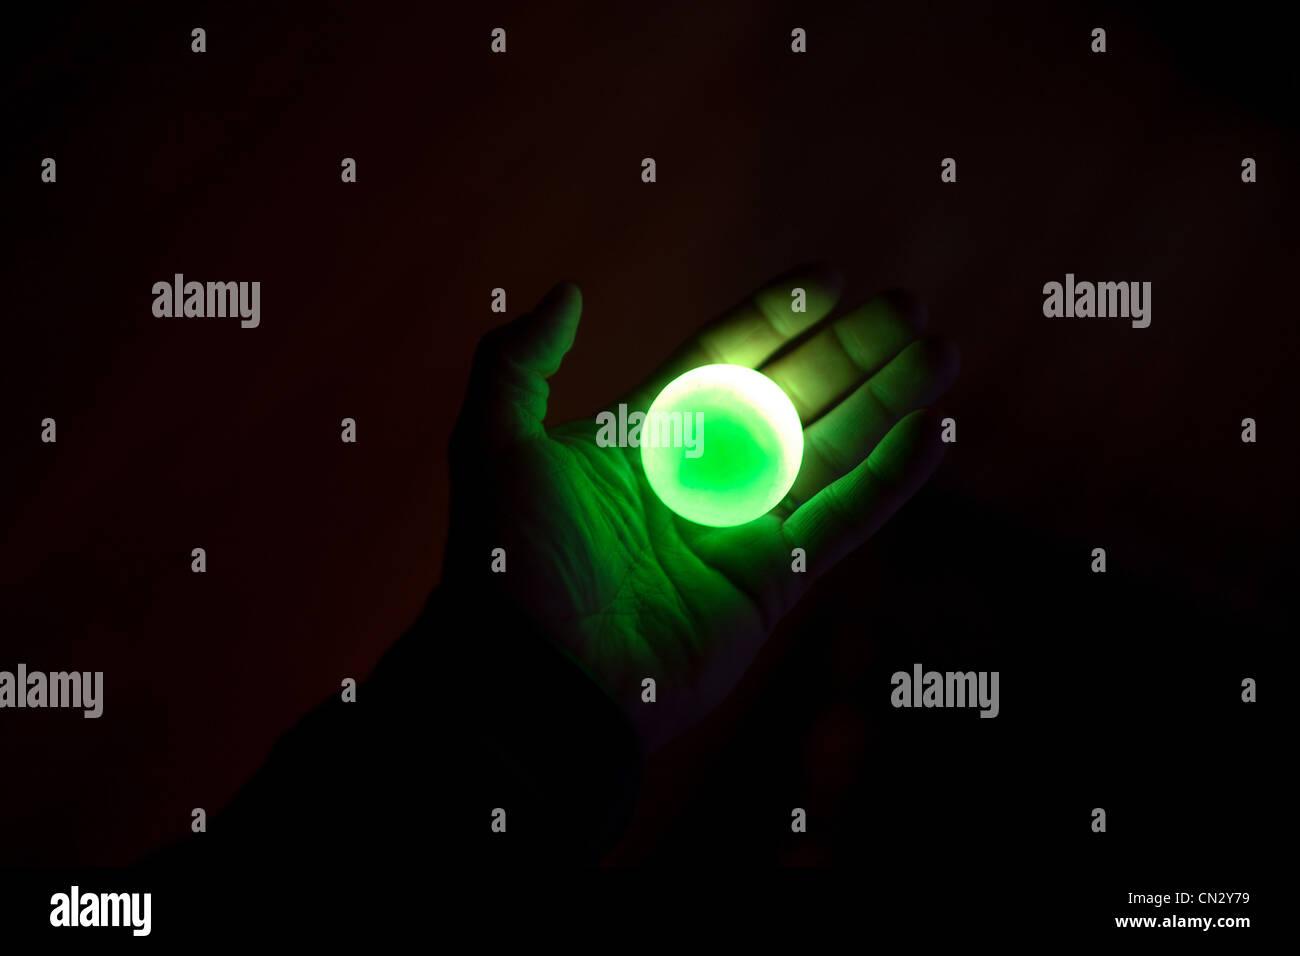 Person holding illuminated green ball - Stock Image